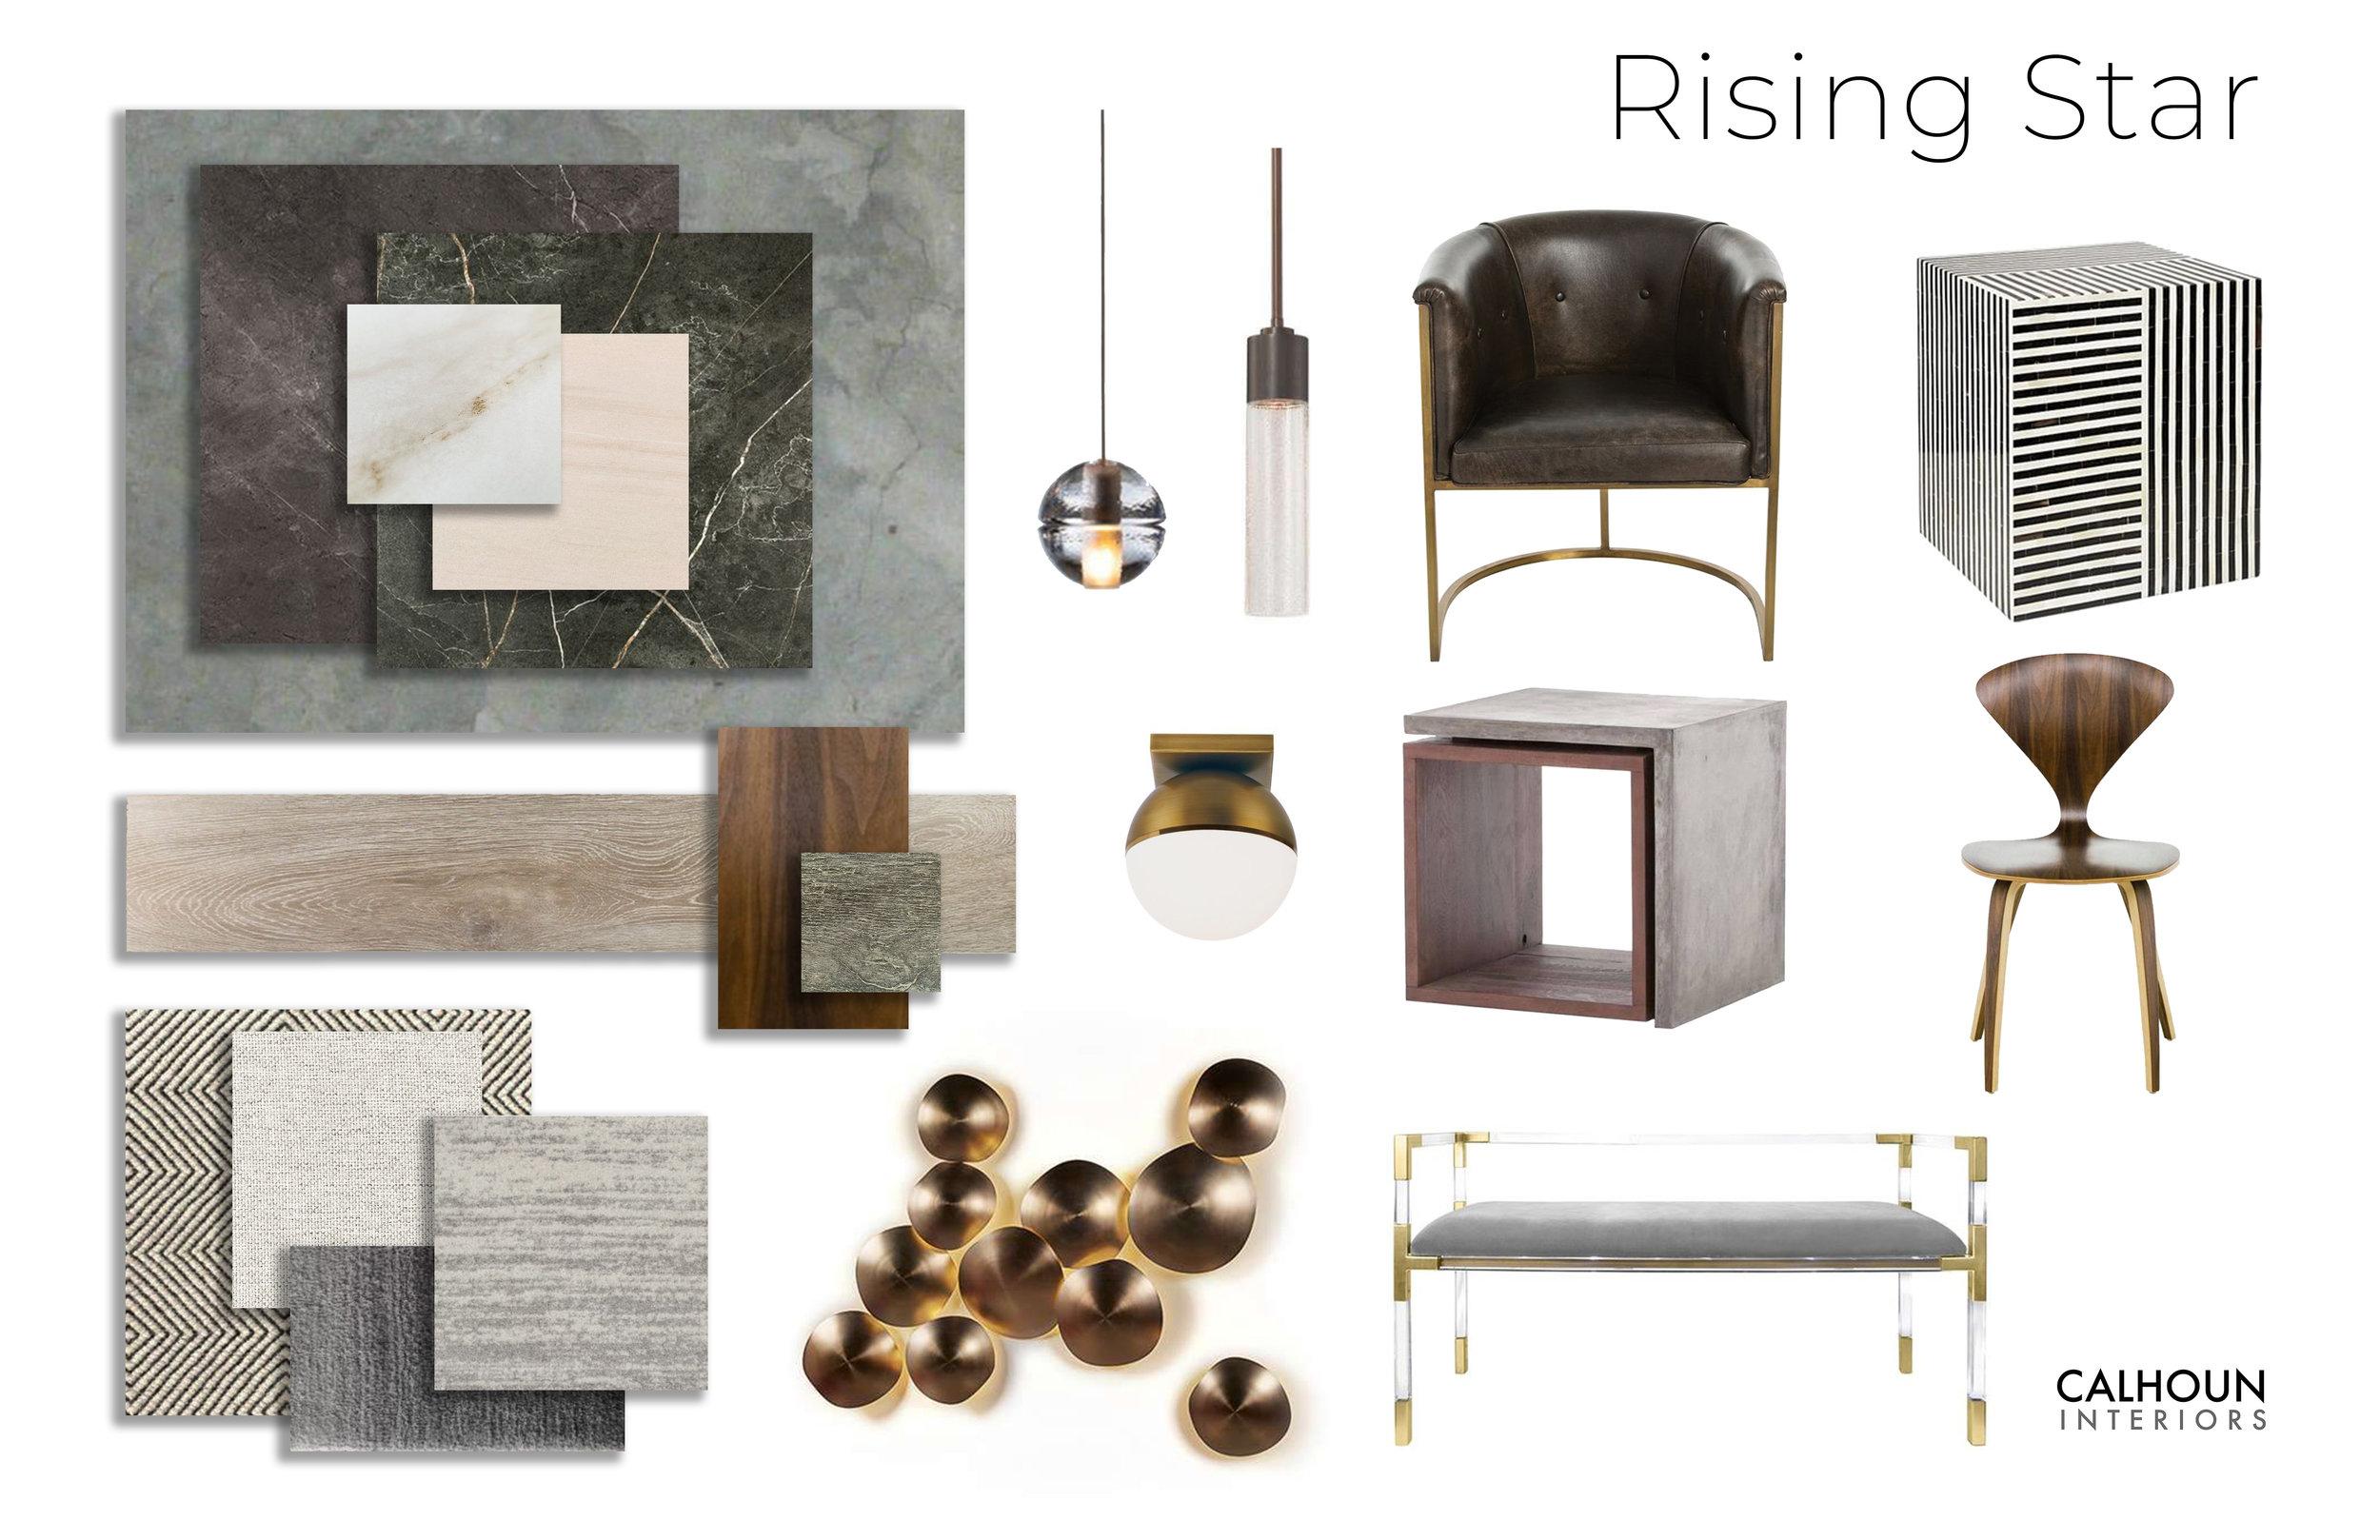 Rising-Star-Material-Board.jpg